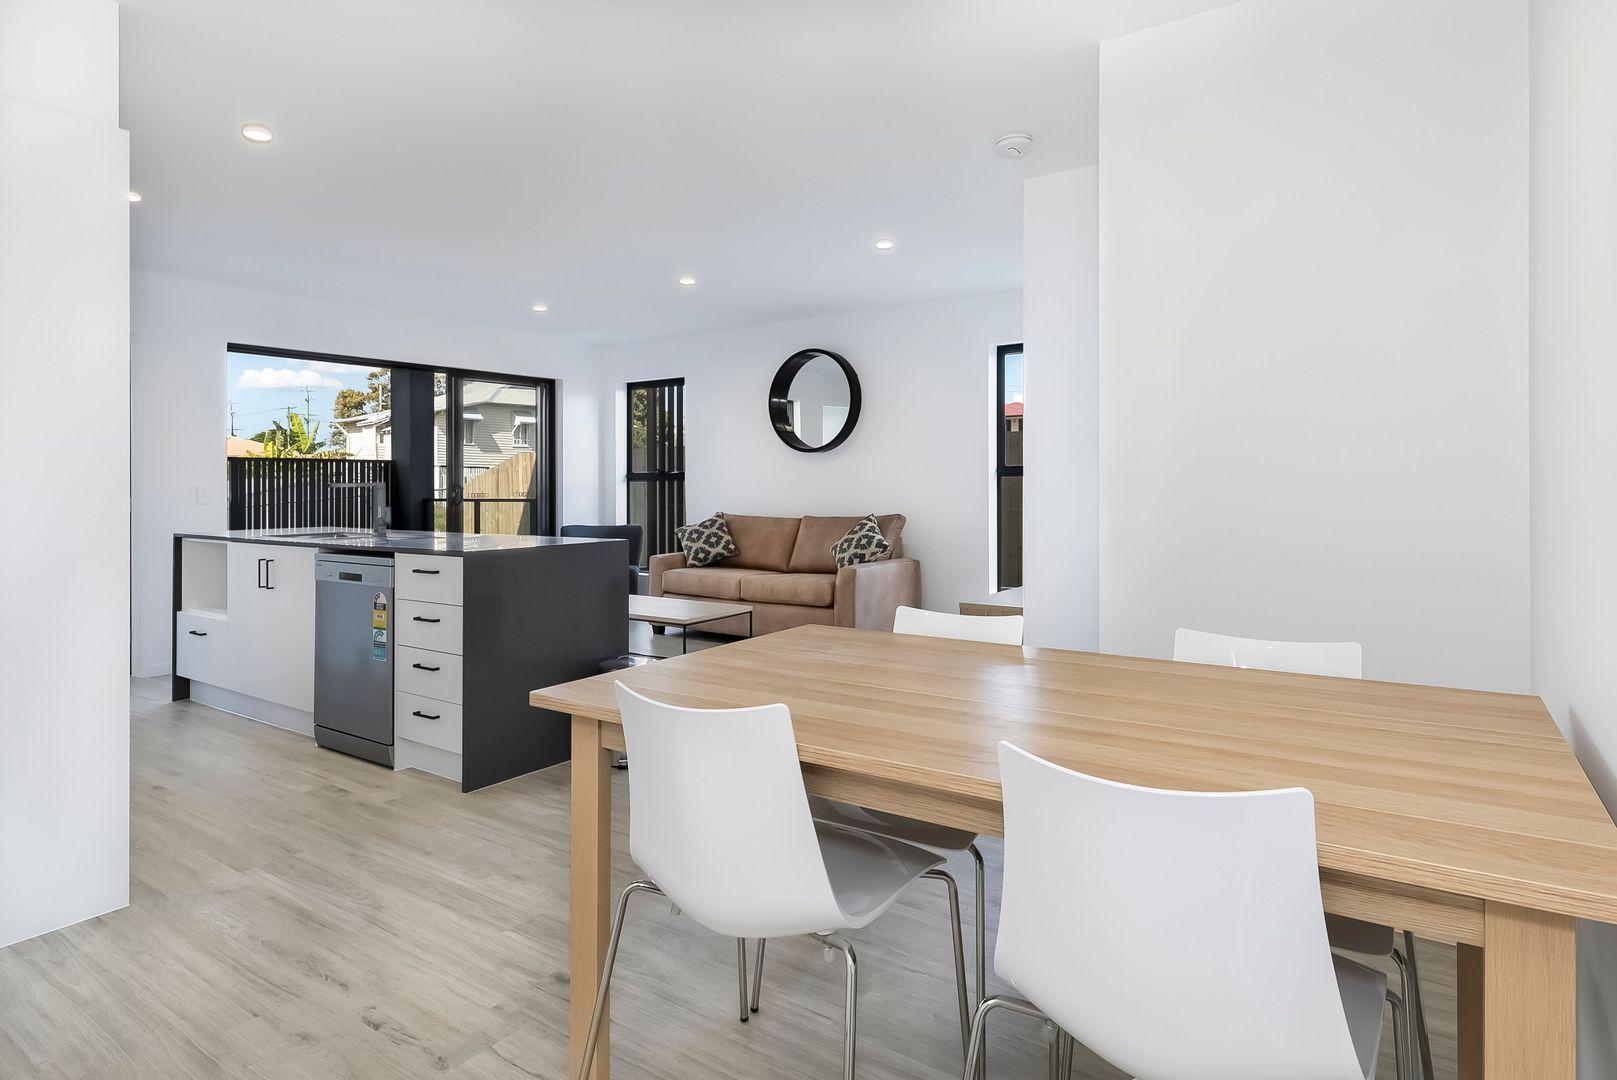 19/27 Lumley Street, Upper Mount Gravatt QLD 4122, Image 1